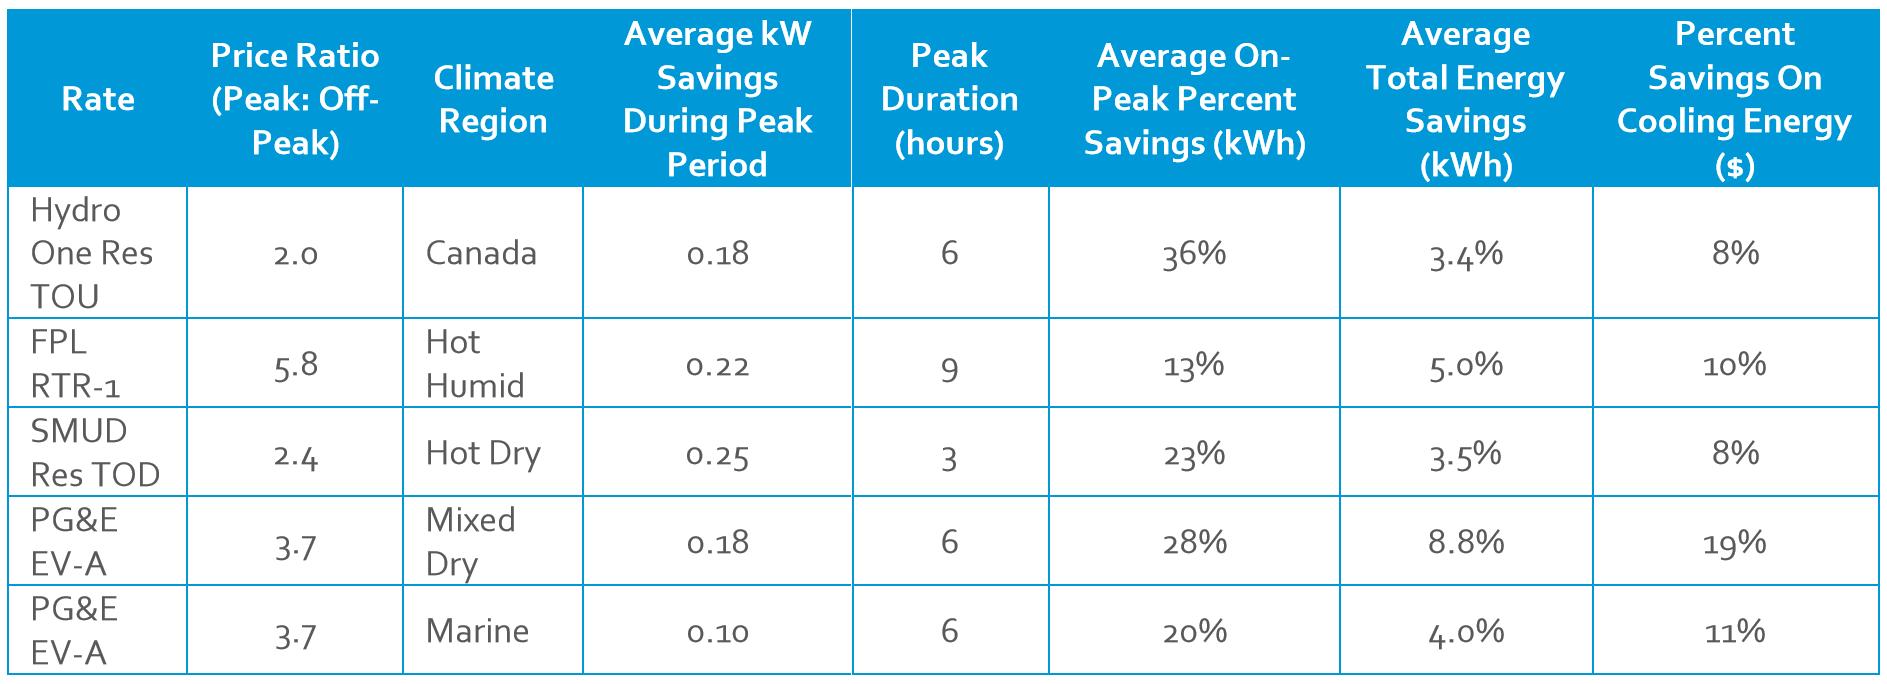 TOU savings across climate zones